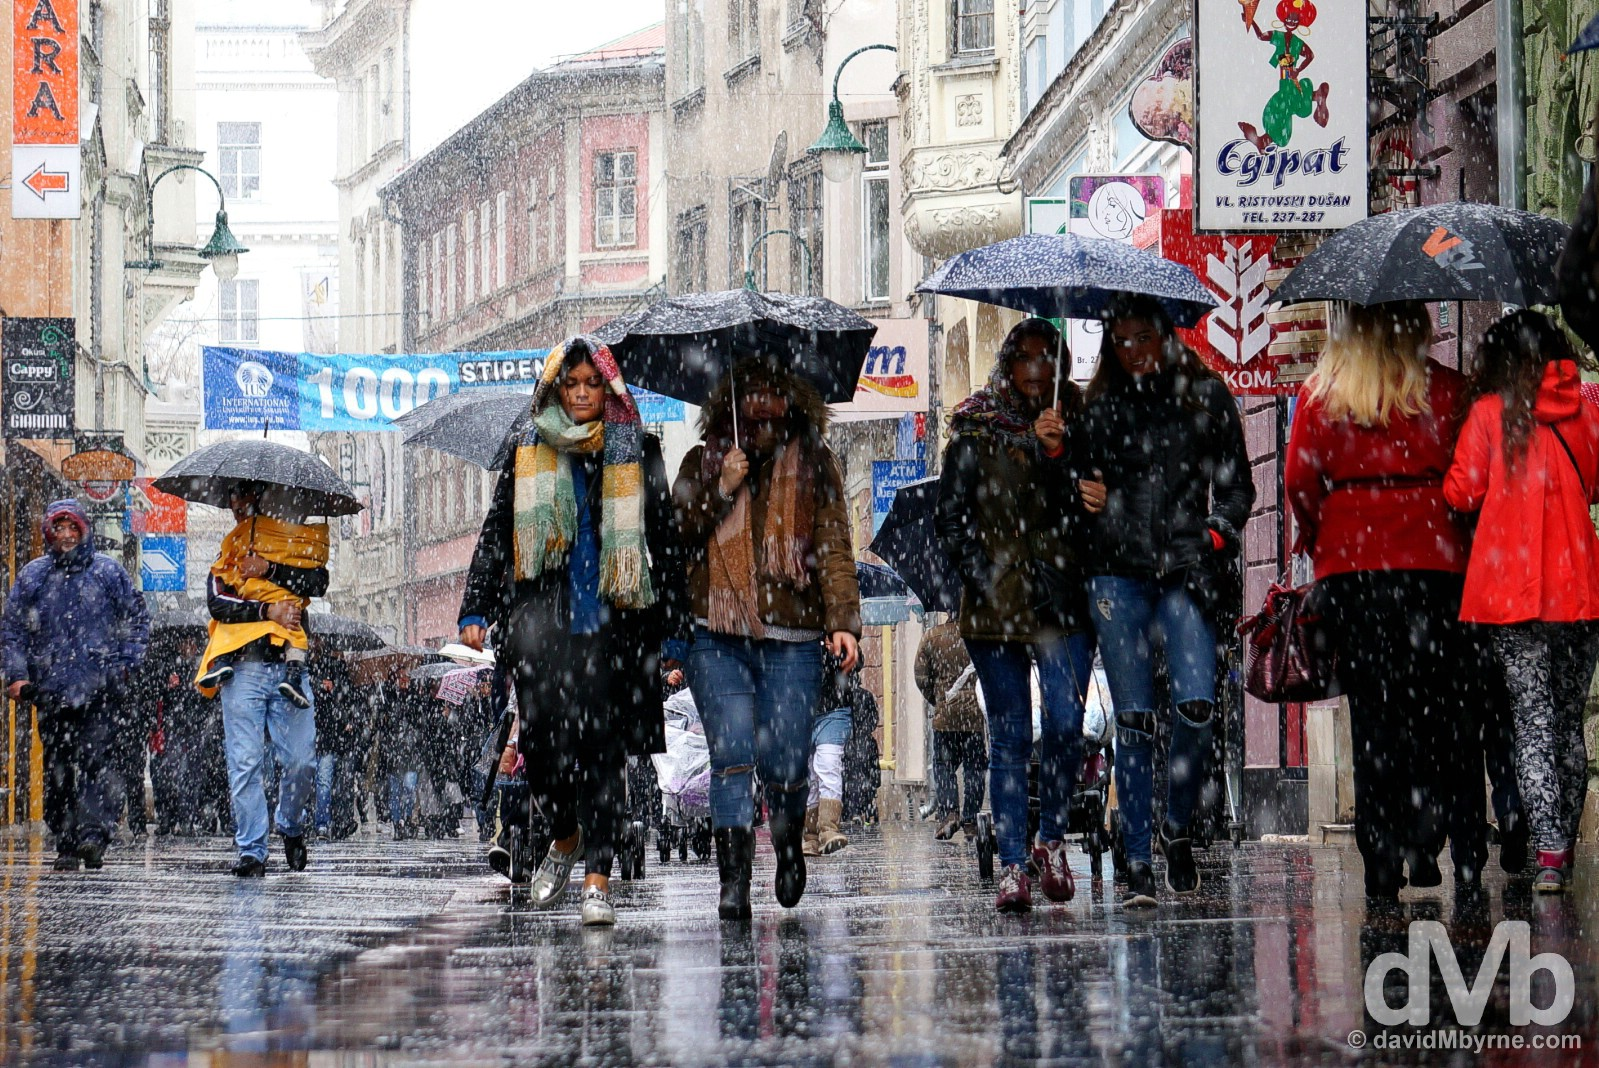 Snow on Ferhadija, central Sarajevo, Bosnia and Herzegovina. April 5, 2015.